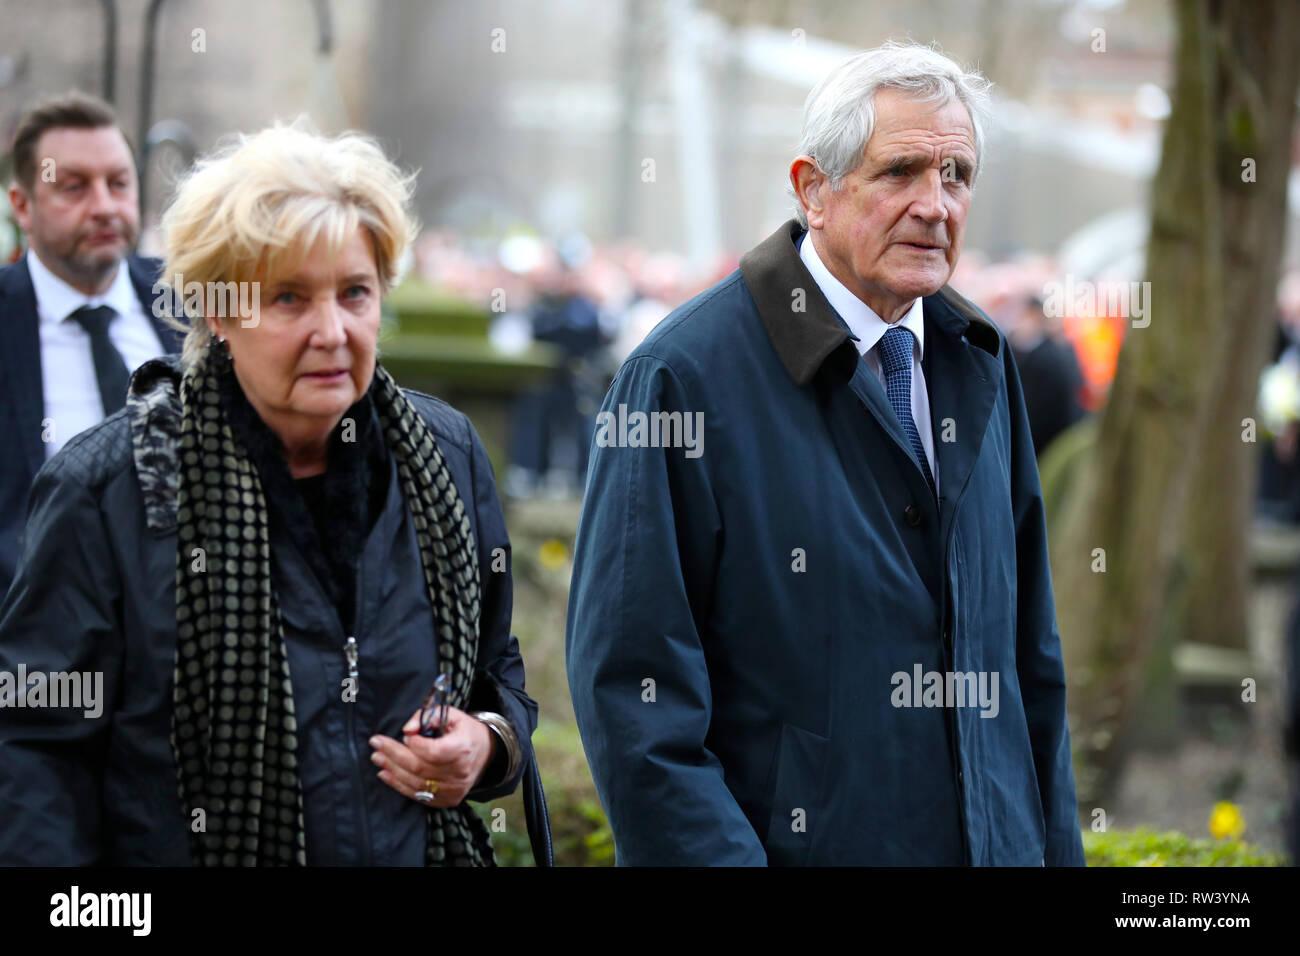 Retired footballer Norman Hunter arrives at the funeral service for Gordon Banks at Stoke Minster. - Stock Image